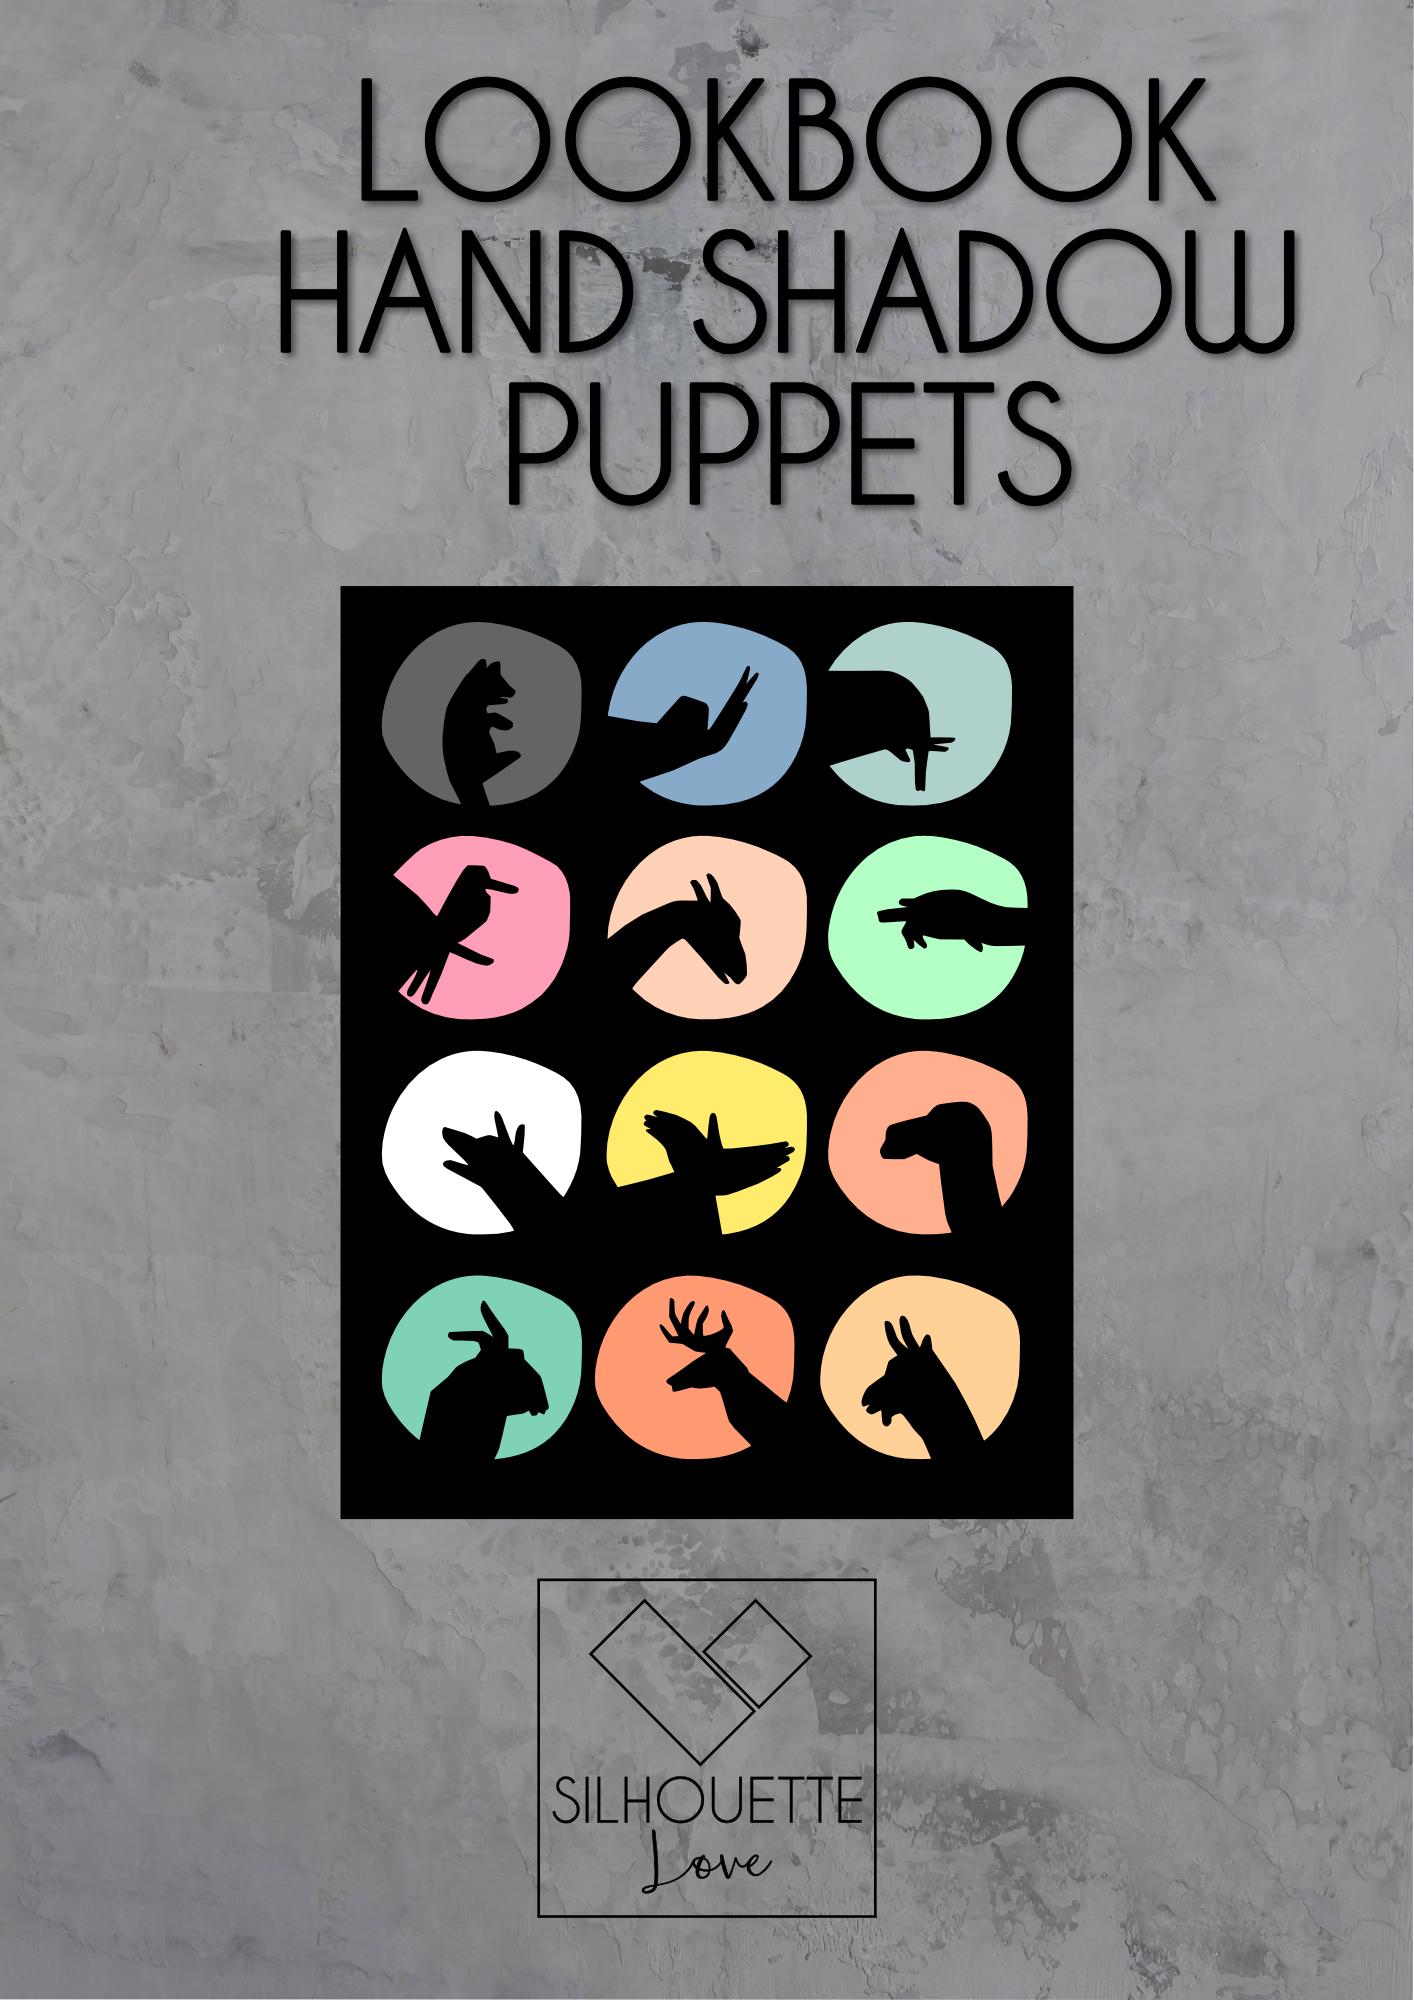 LOOKBOOK HAND SHADOW PUPPETS